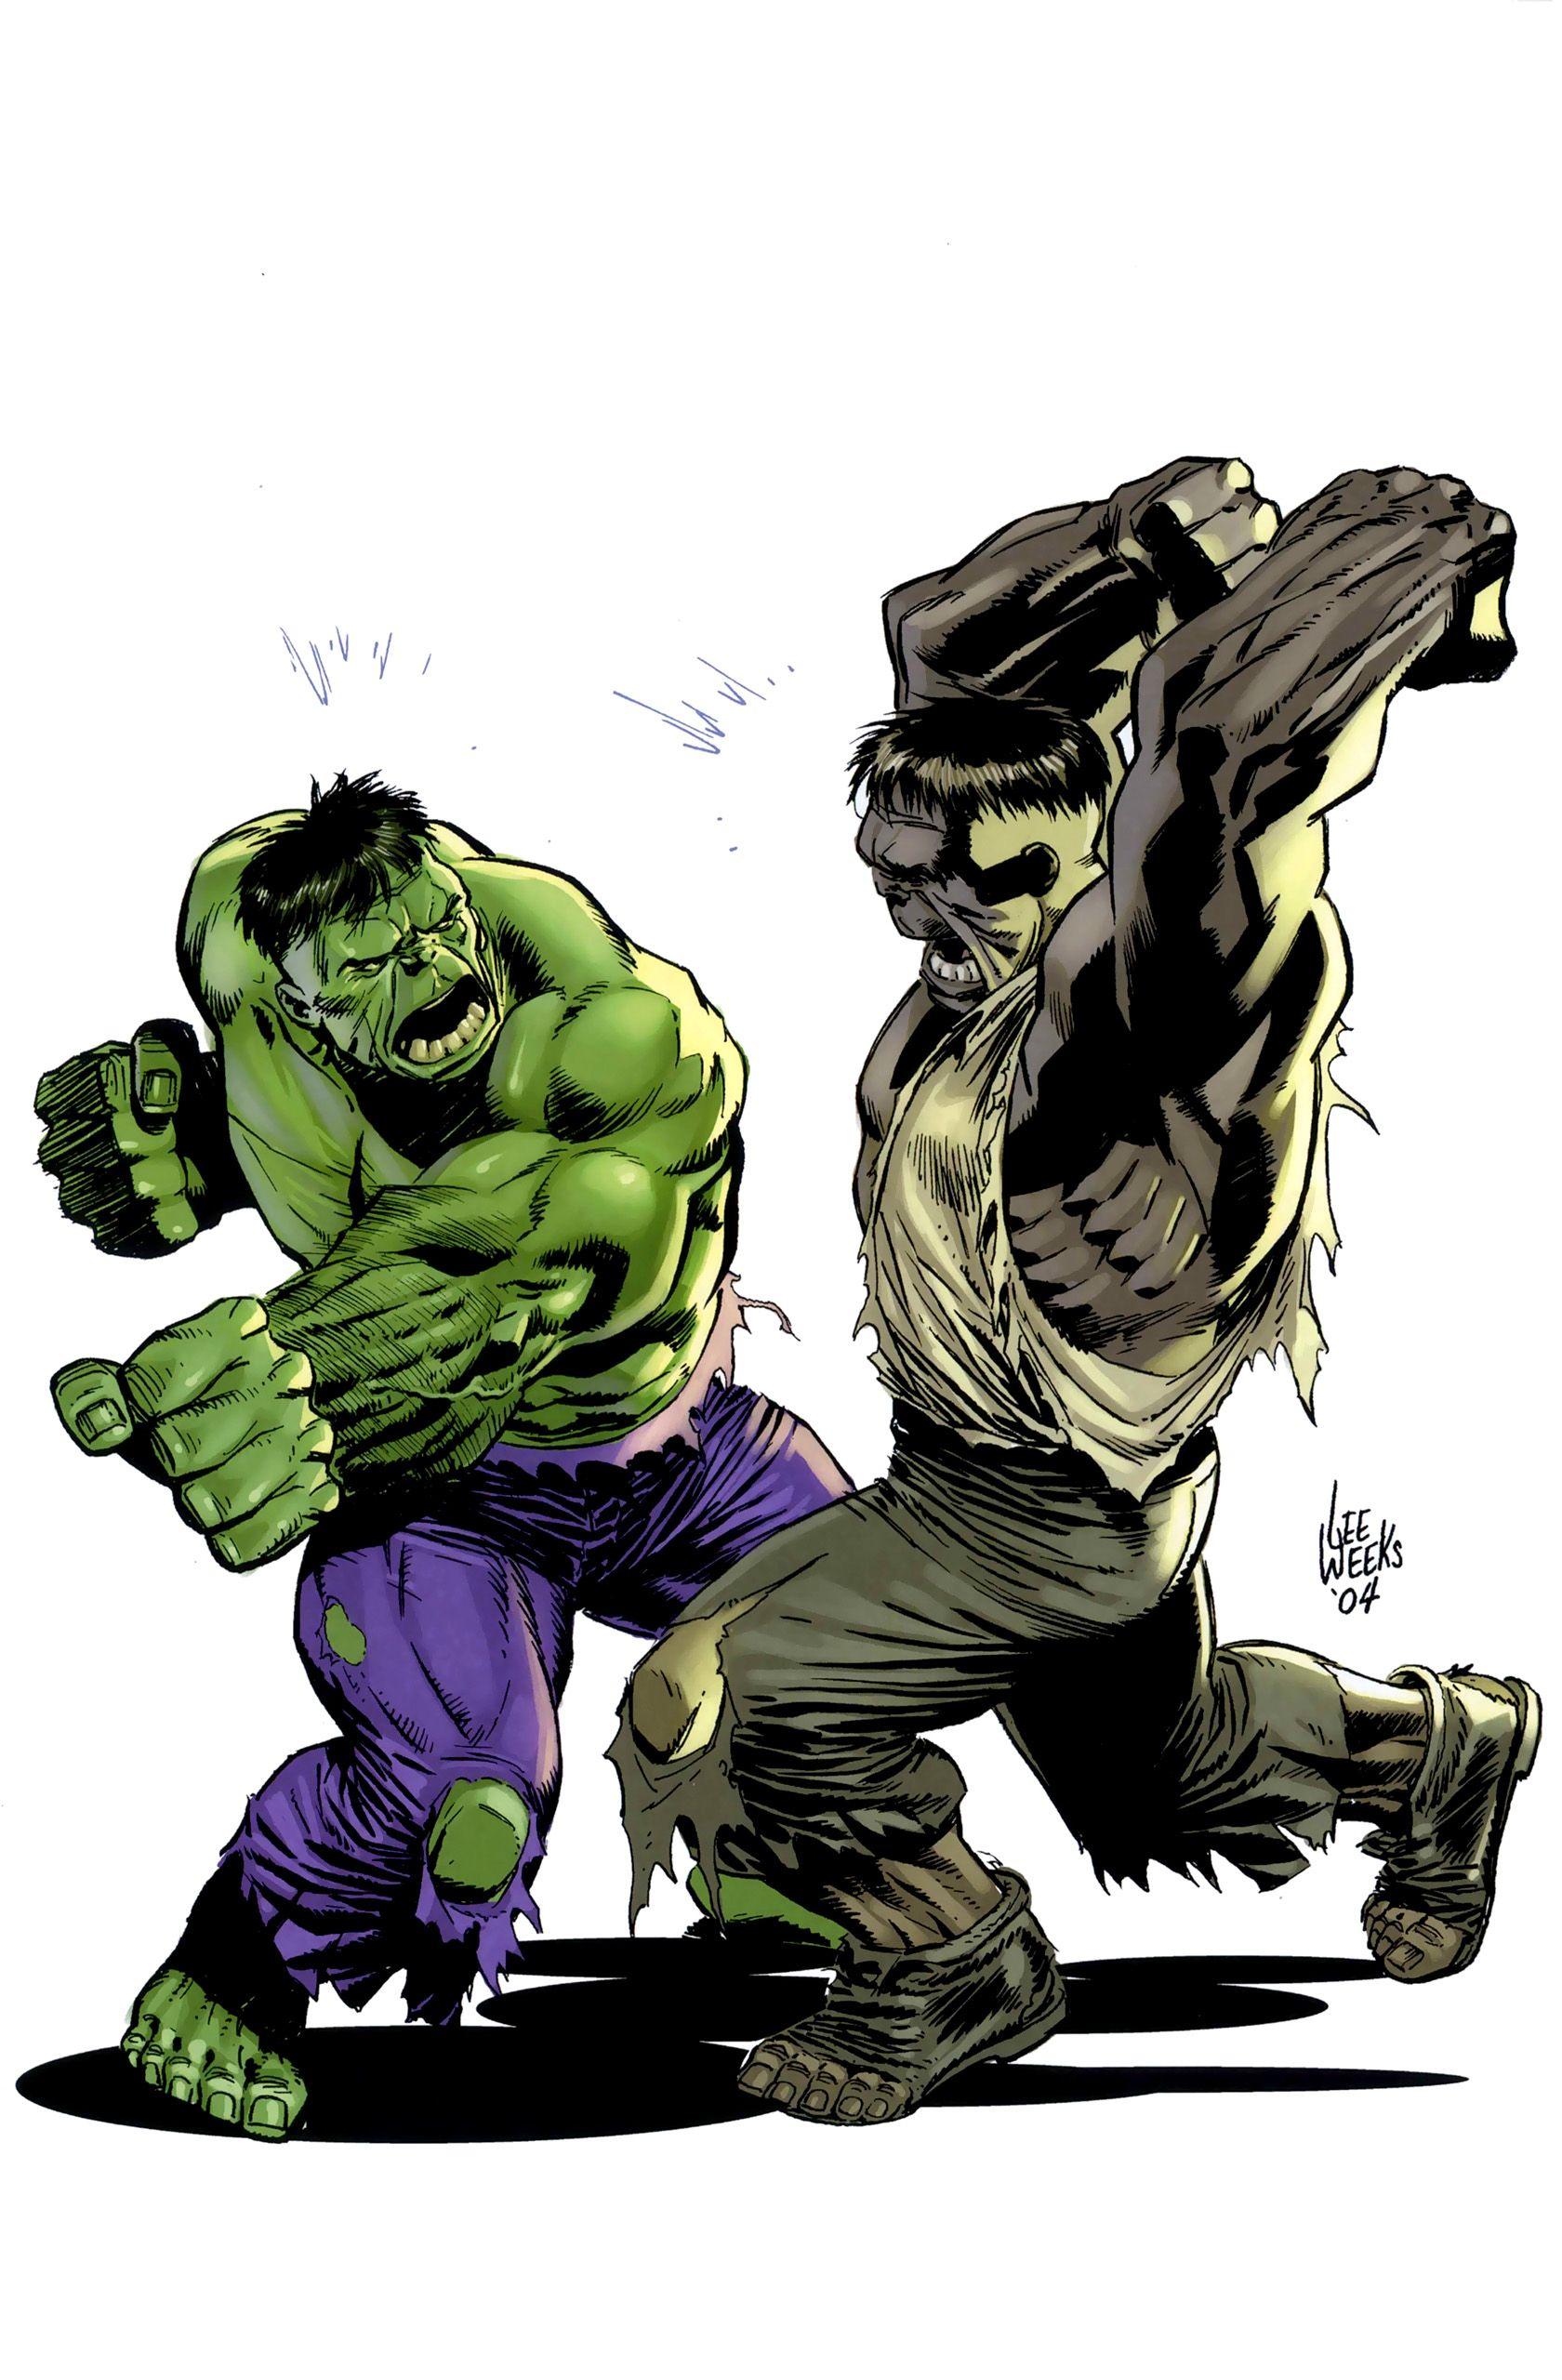 Hulk #Fan #Art  (Green Hulk vs Gray Hulk) By: Lee Weeks  (THE * 5